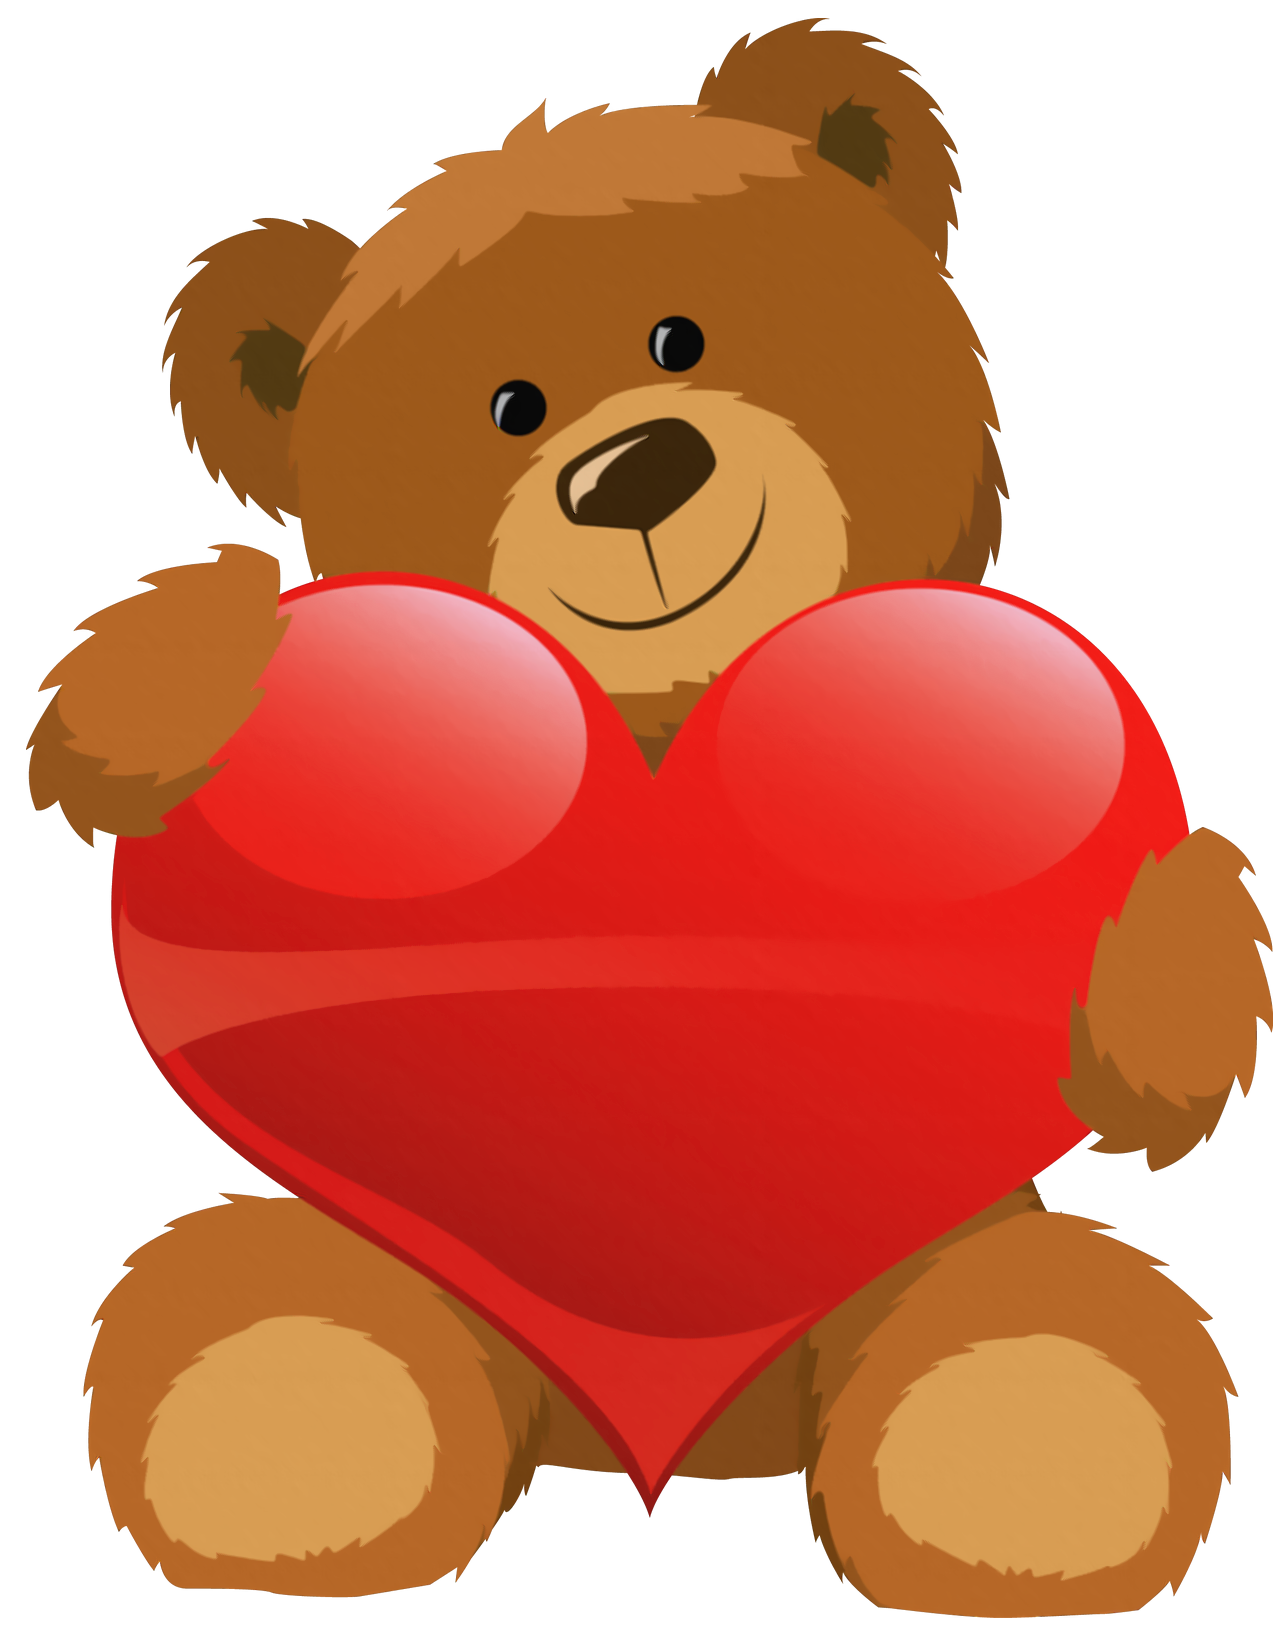 medium resolution of teddy bear cute bear cute teddy clipart clipartmonk free clip art images 2 bear cartoon